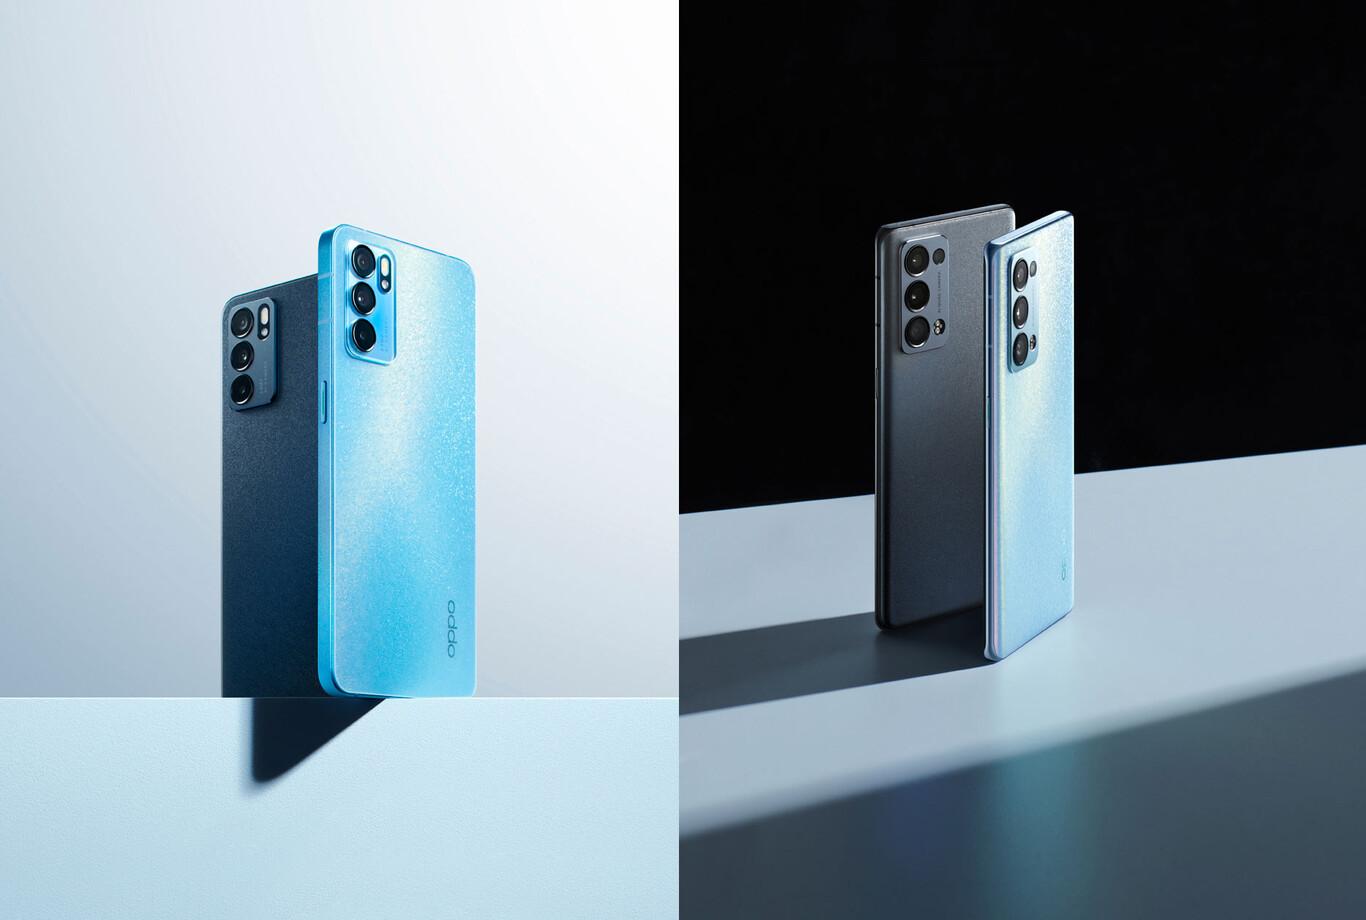 OPPO Reno6 5G ve Reno6 Pro 5G: Benzer görünüm, farklı performans